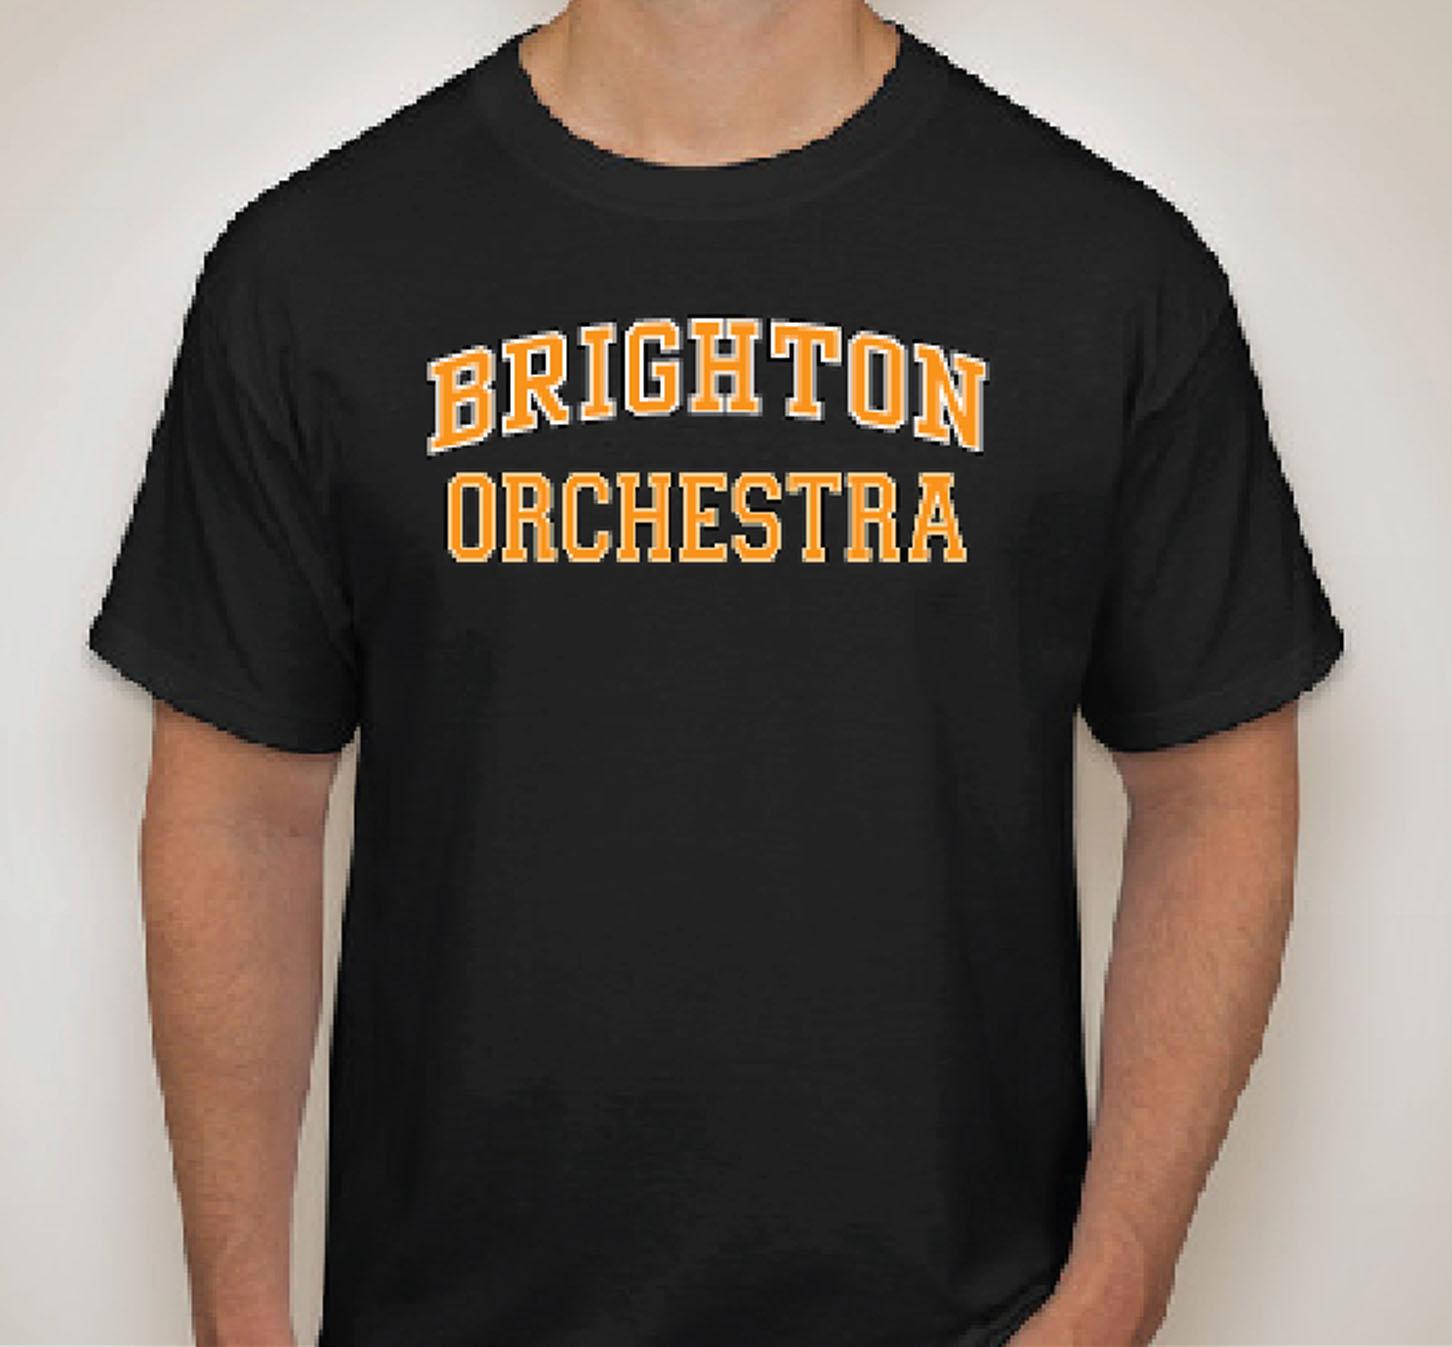 Brighton Orchestra Tee